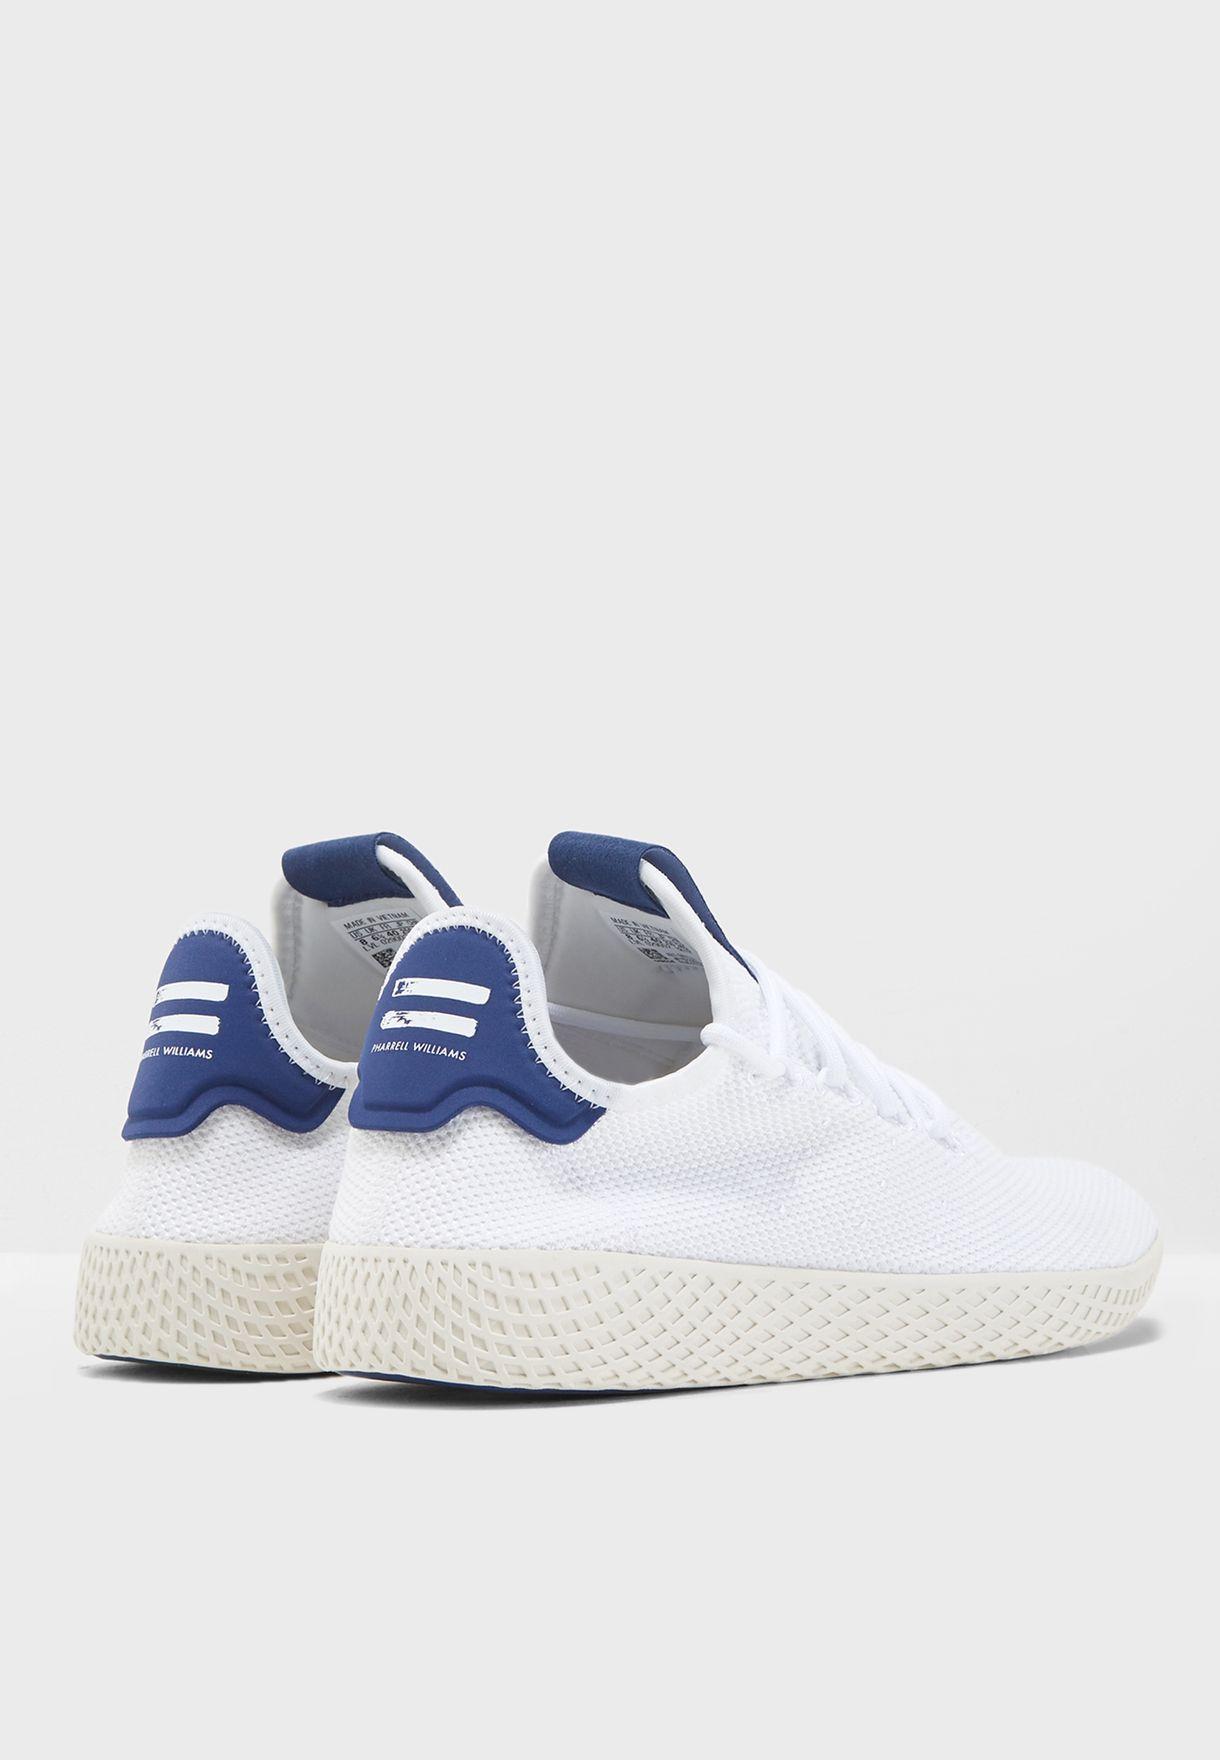 41d6230a2 Shop adidas Originals white Pharrell Williams Hu Tennis DB2559 for ...